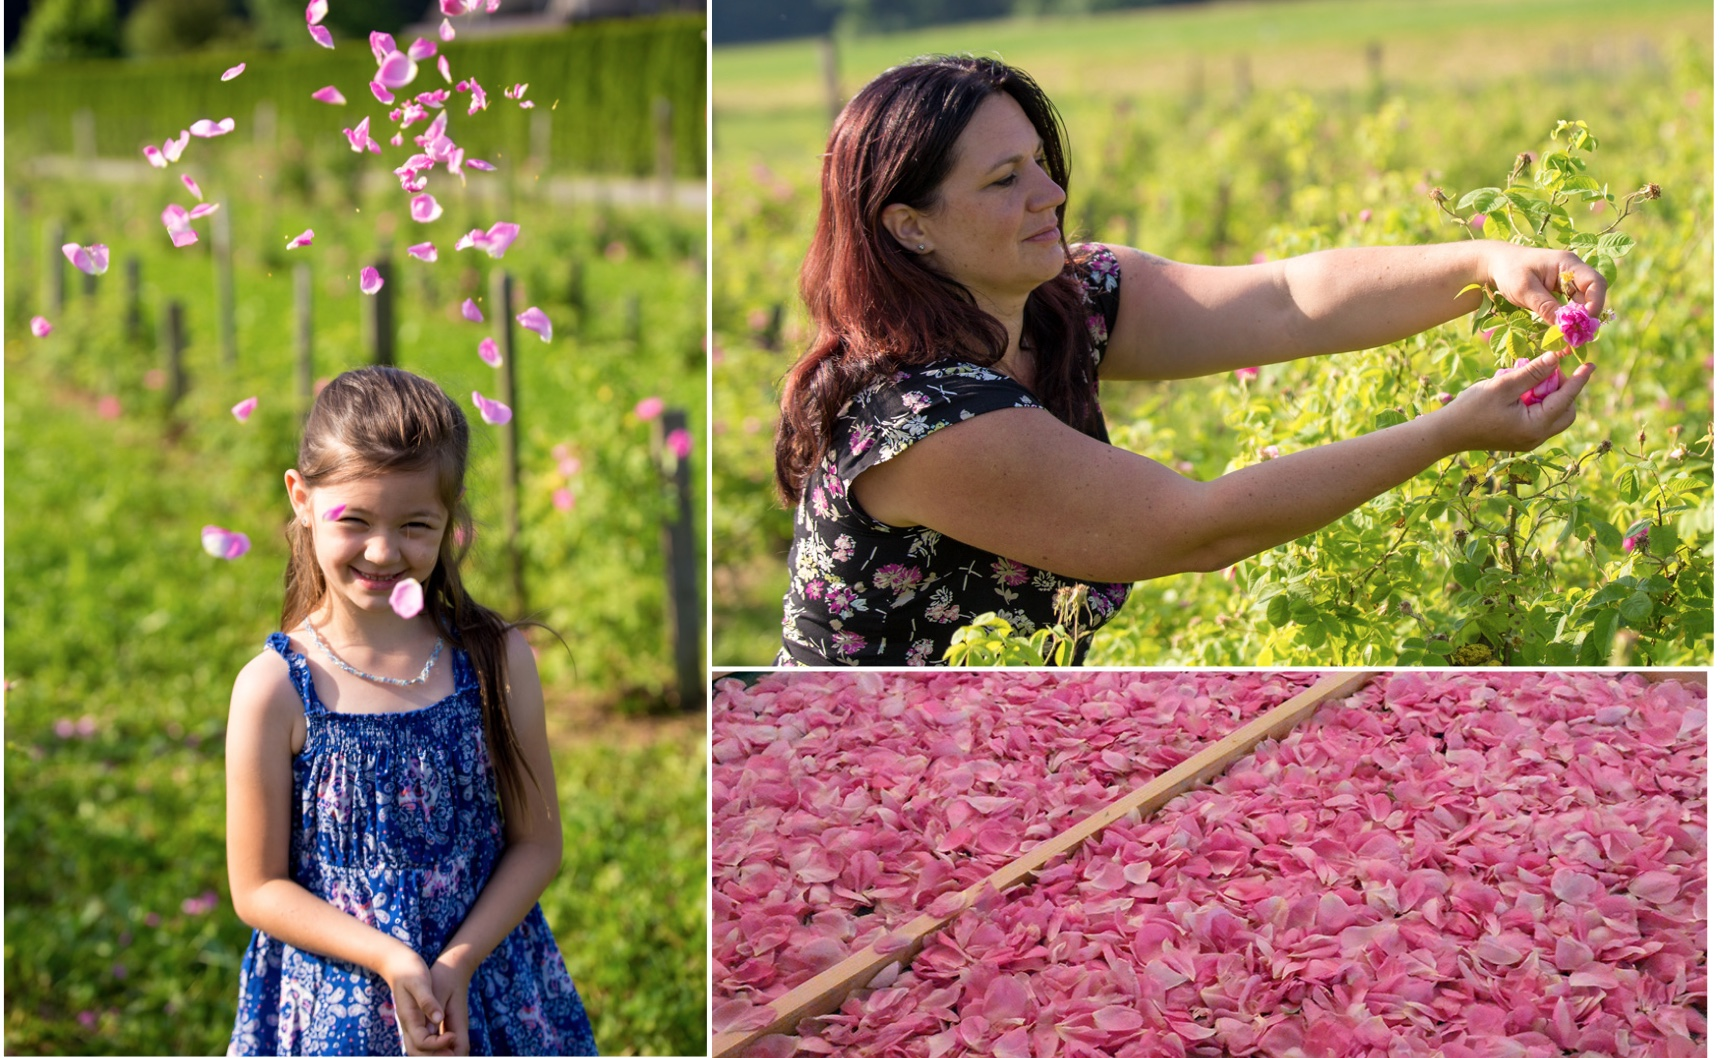 Mädchen mit Rosen, Frau pflückt Rosenblüten und Rosenblüten Damaszener Rose